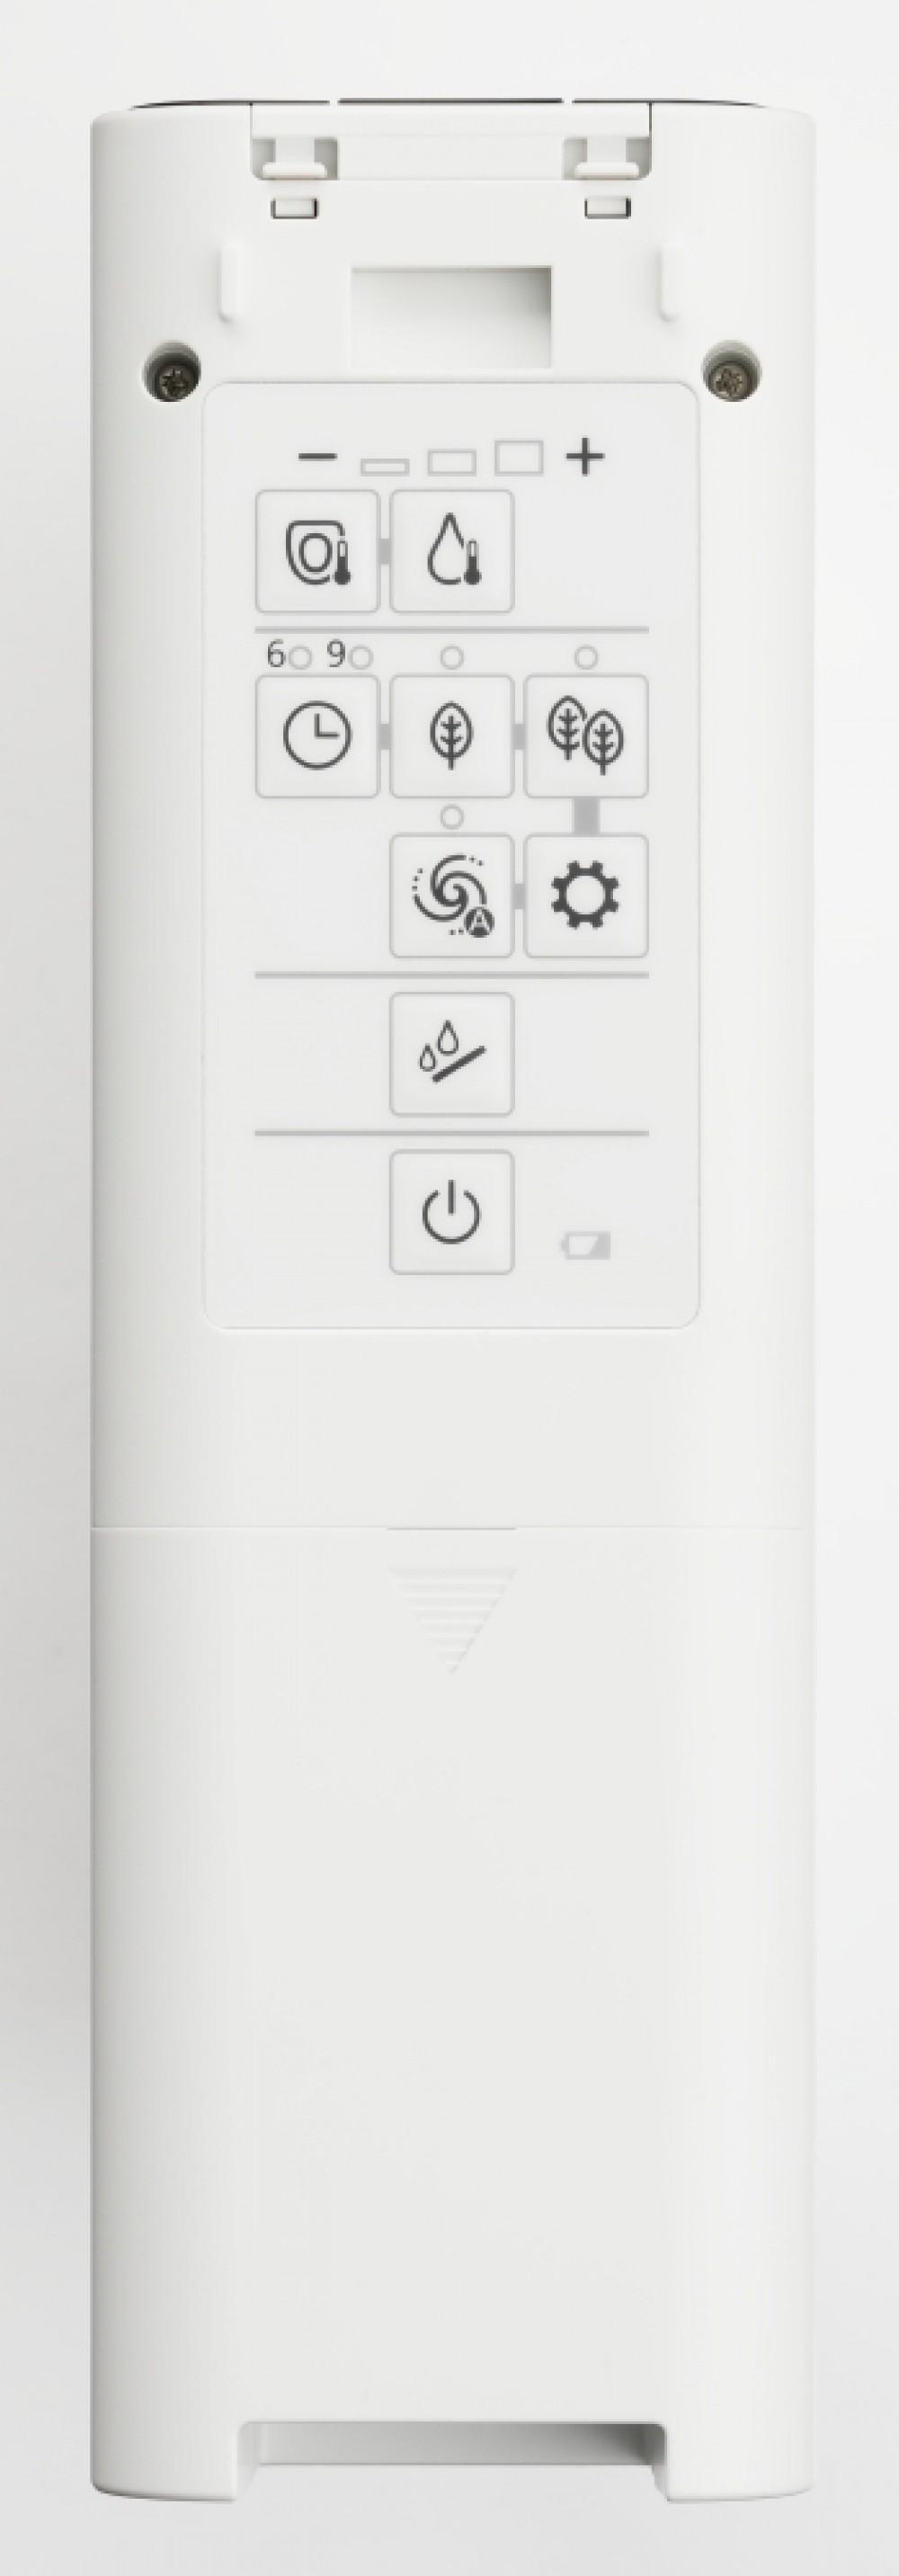 TOTO washlet SX remote control